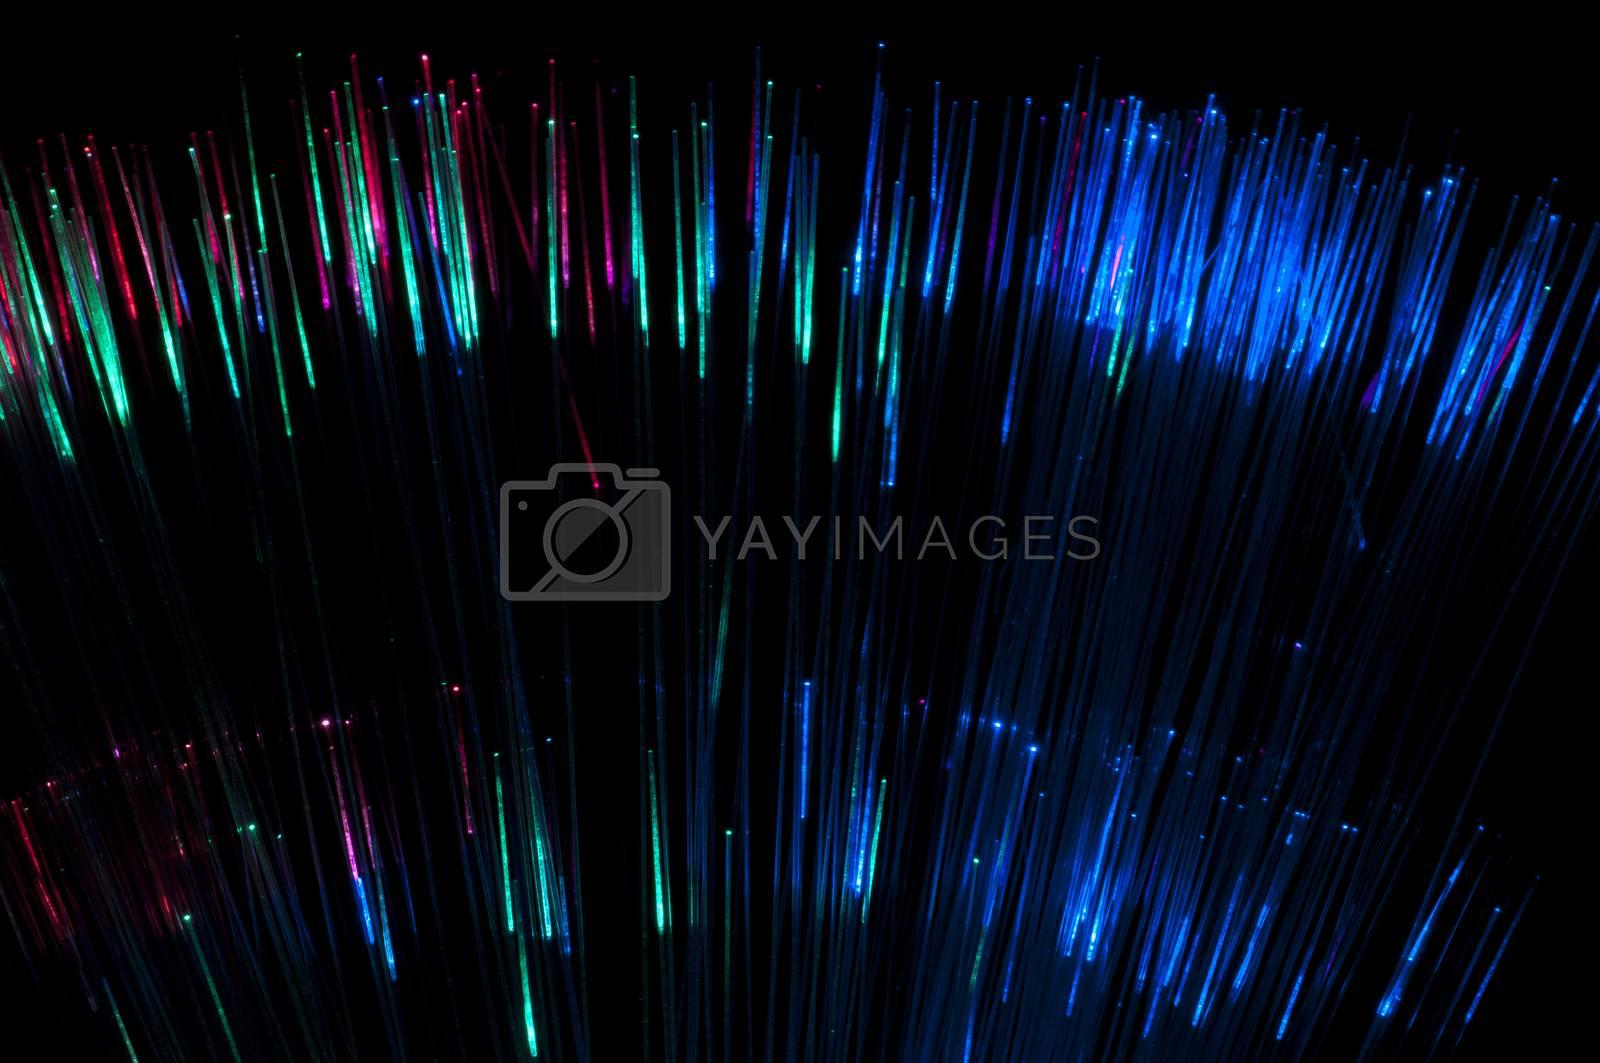 Multicolored optical fibers